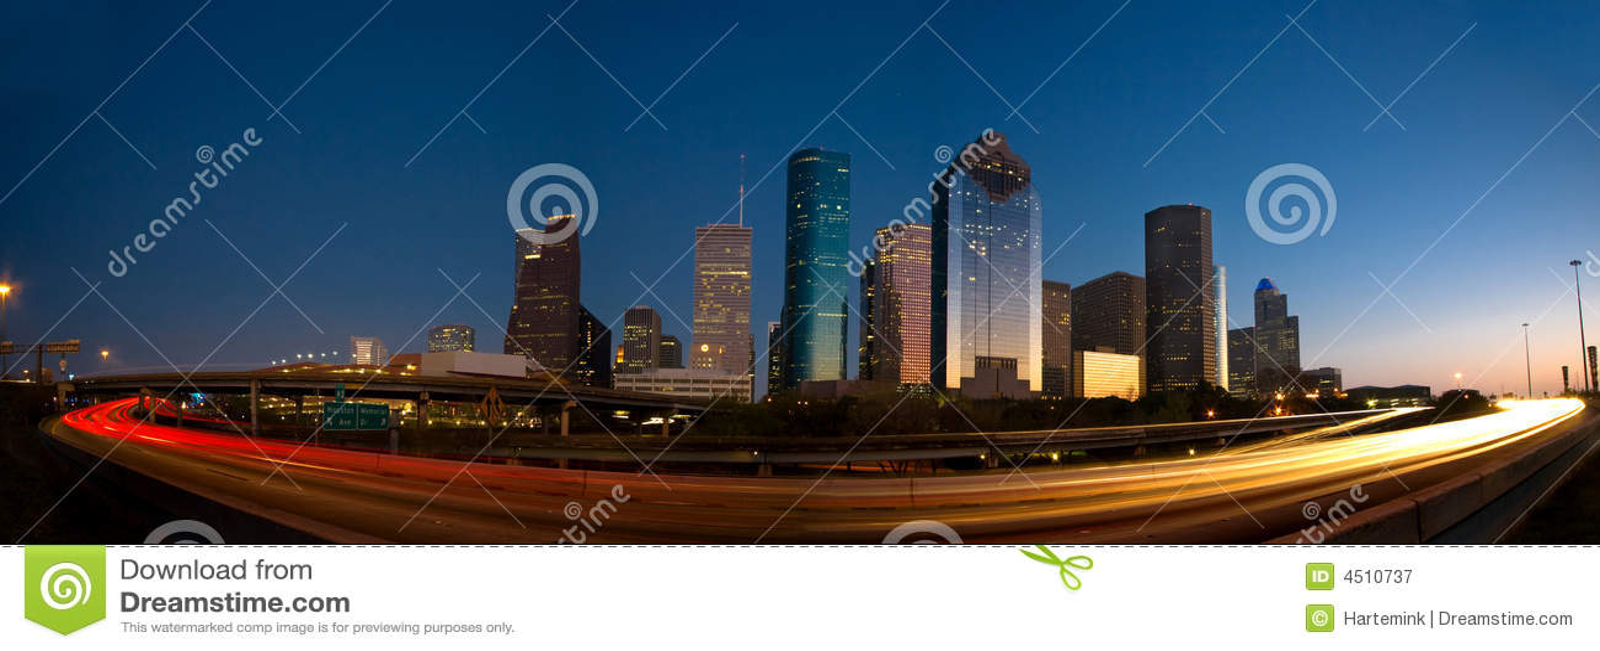 Houston skyline and traffic at sunset